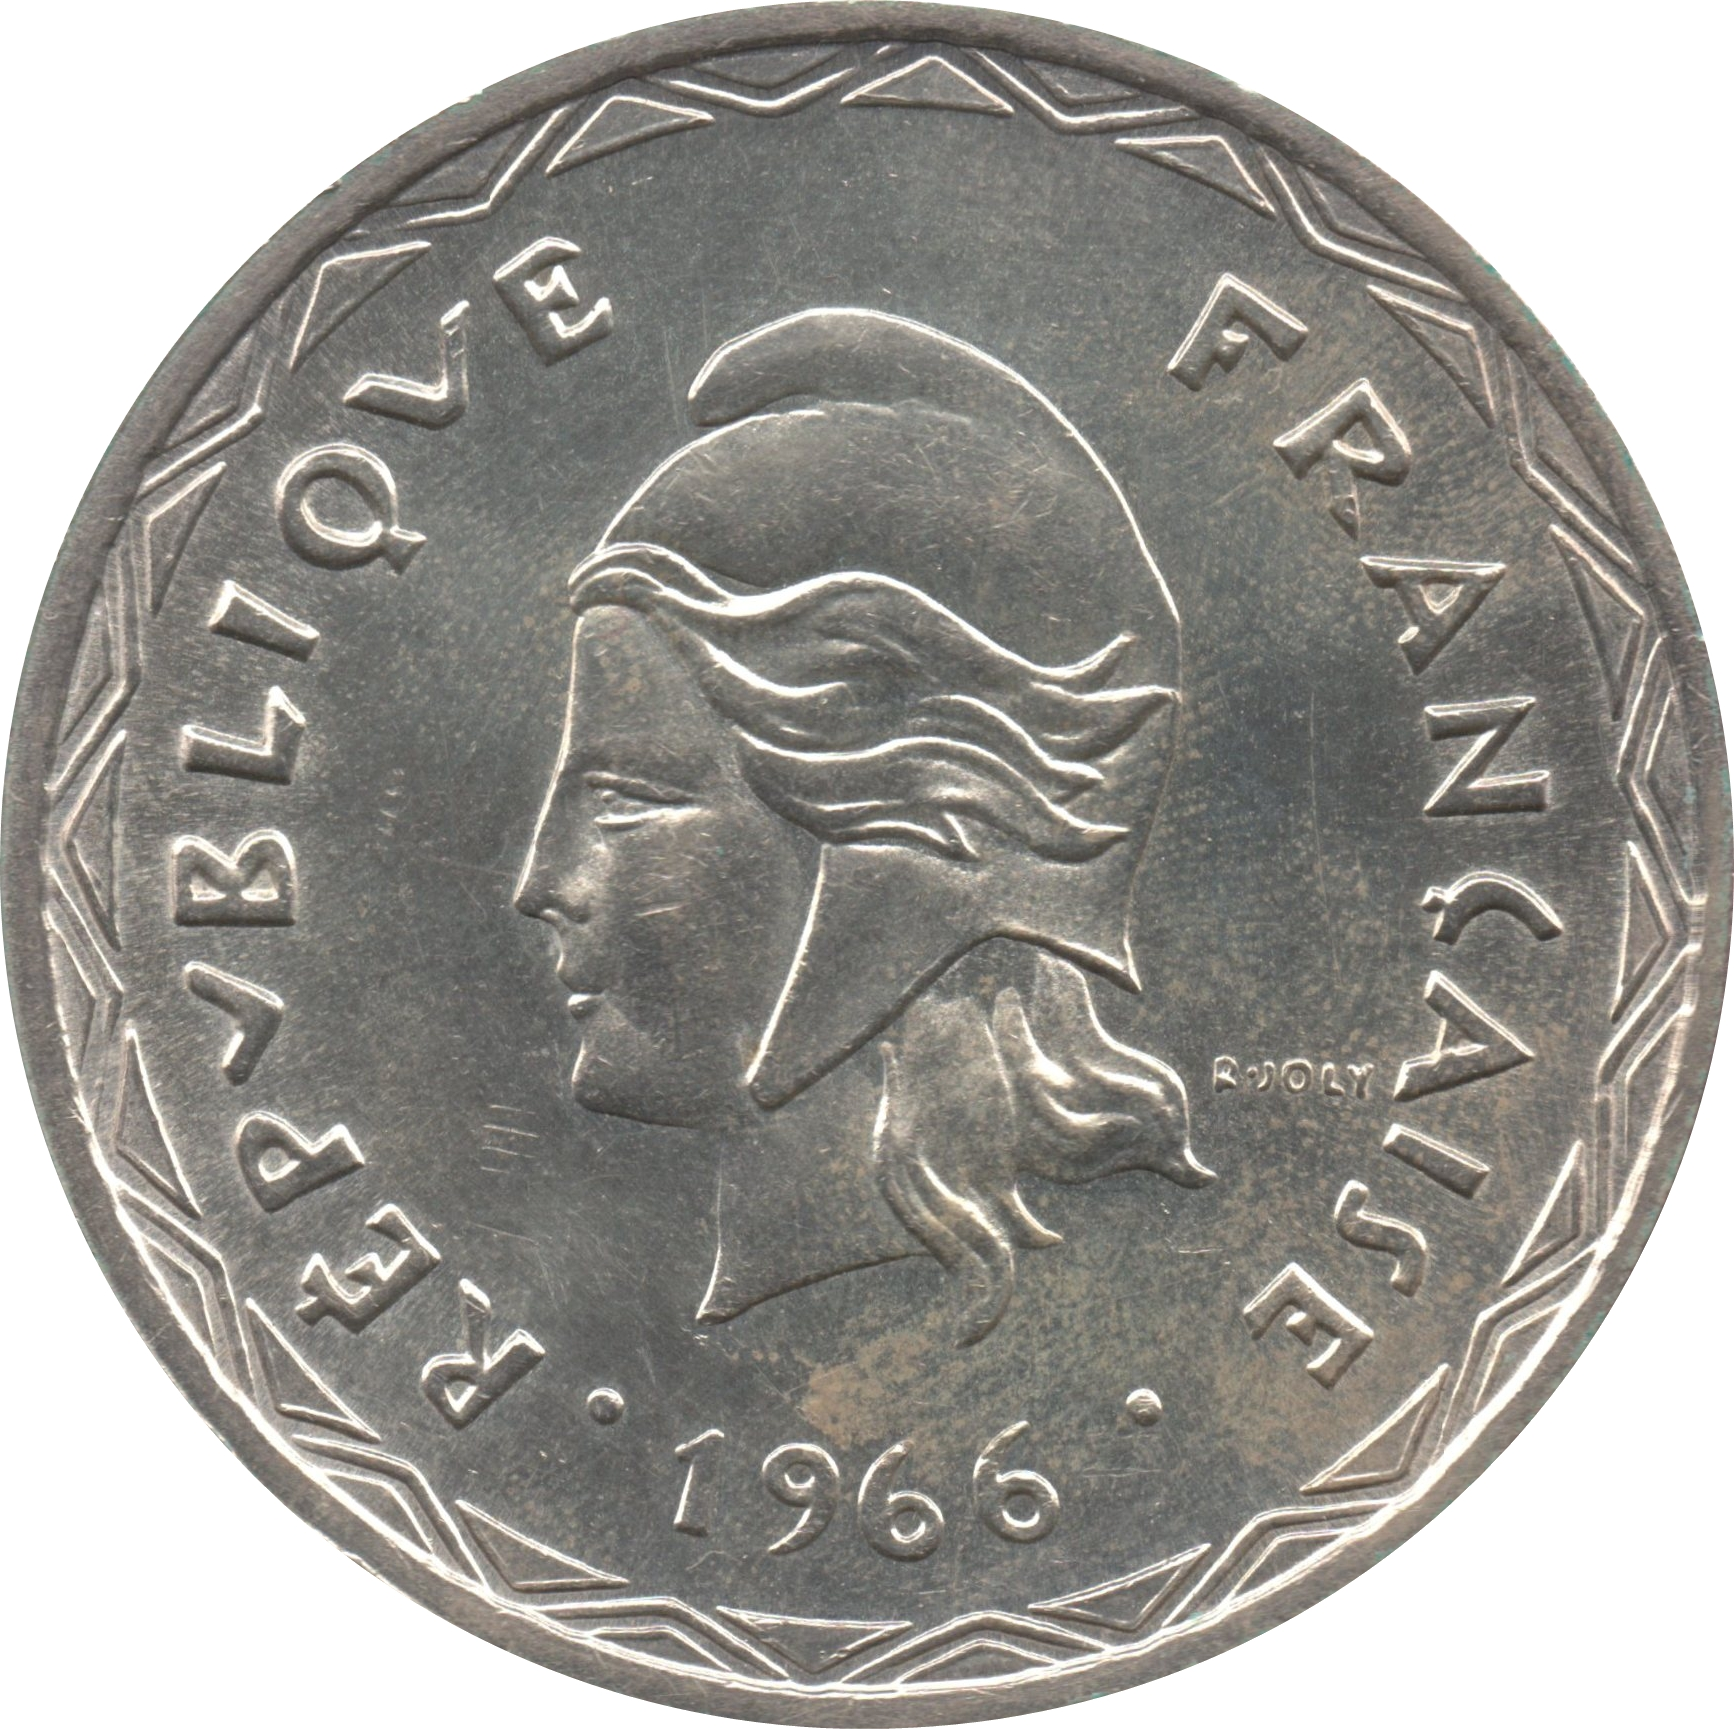 repvbliqve francaise coin